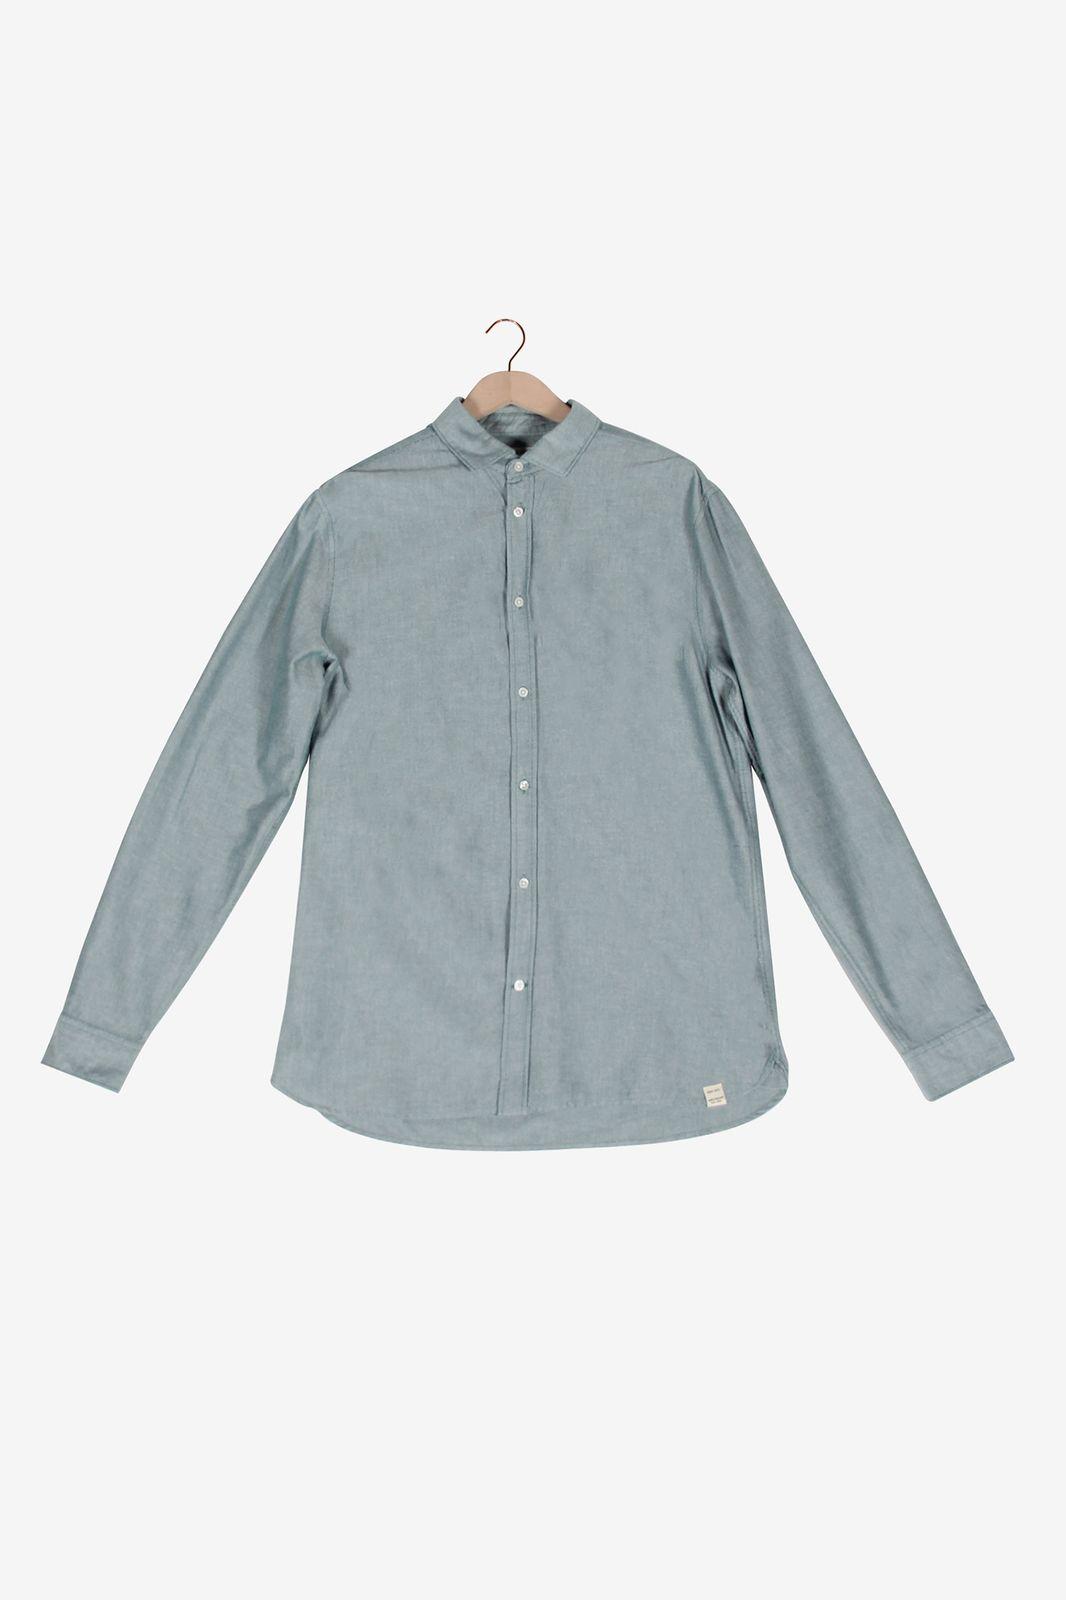 Groenkleurig overhemd